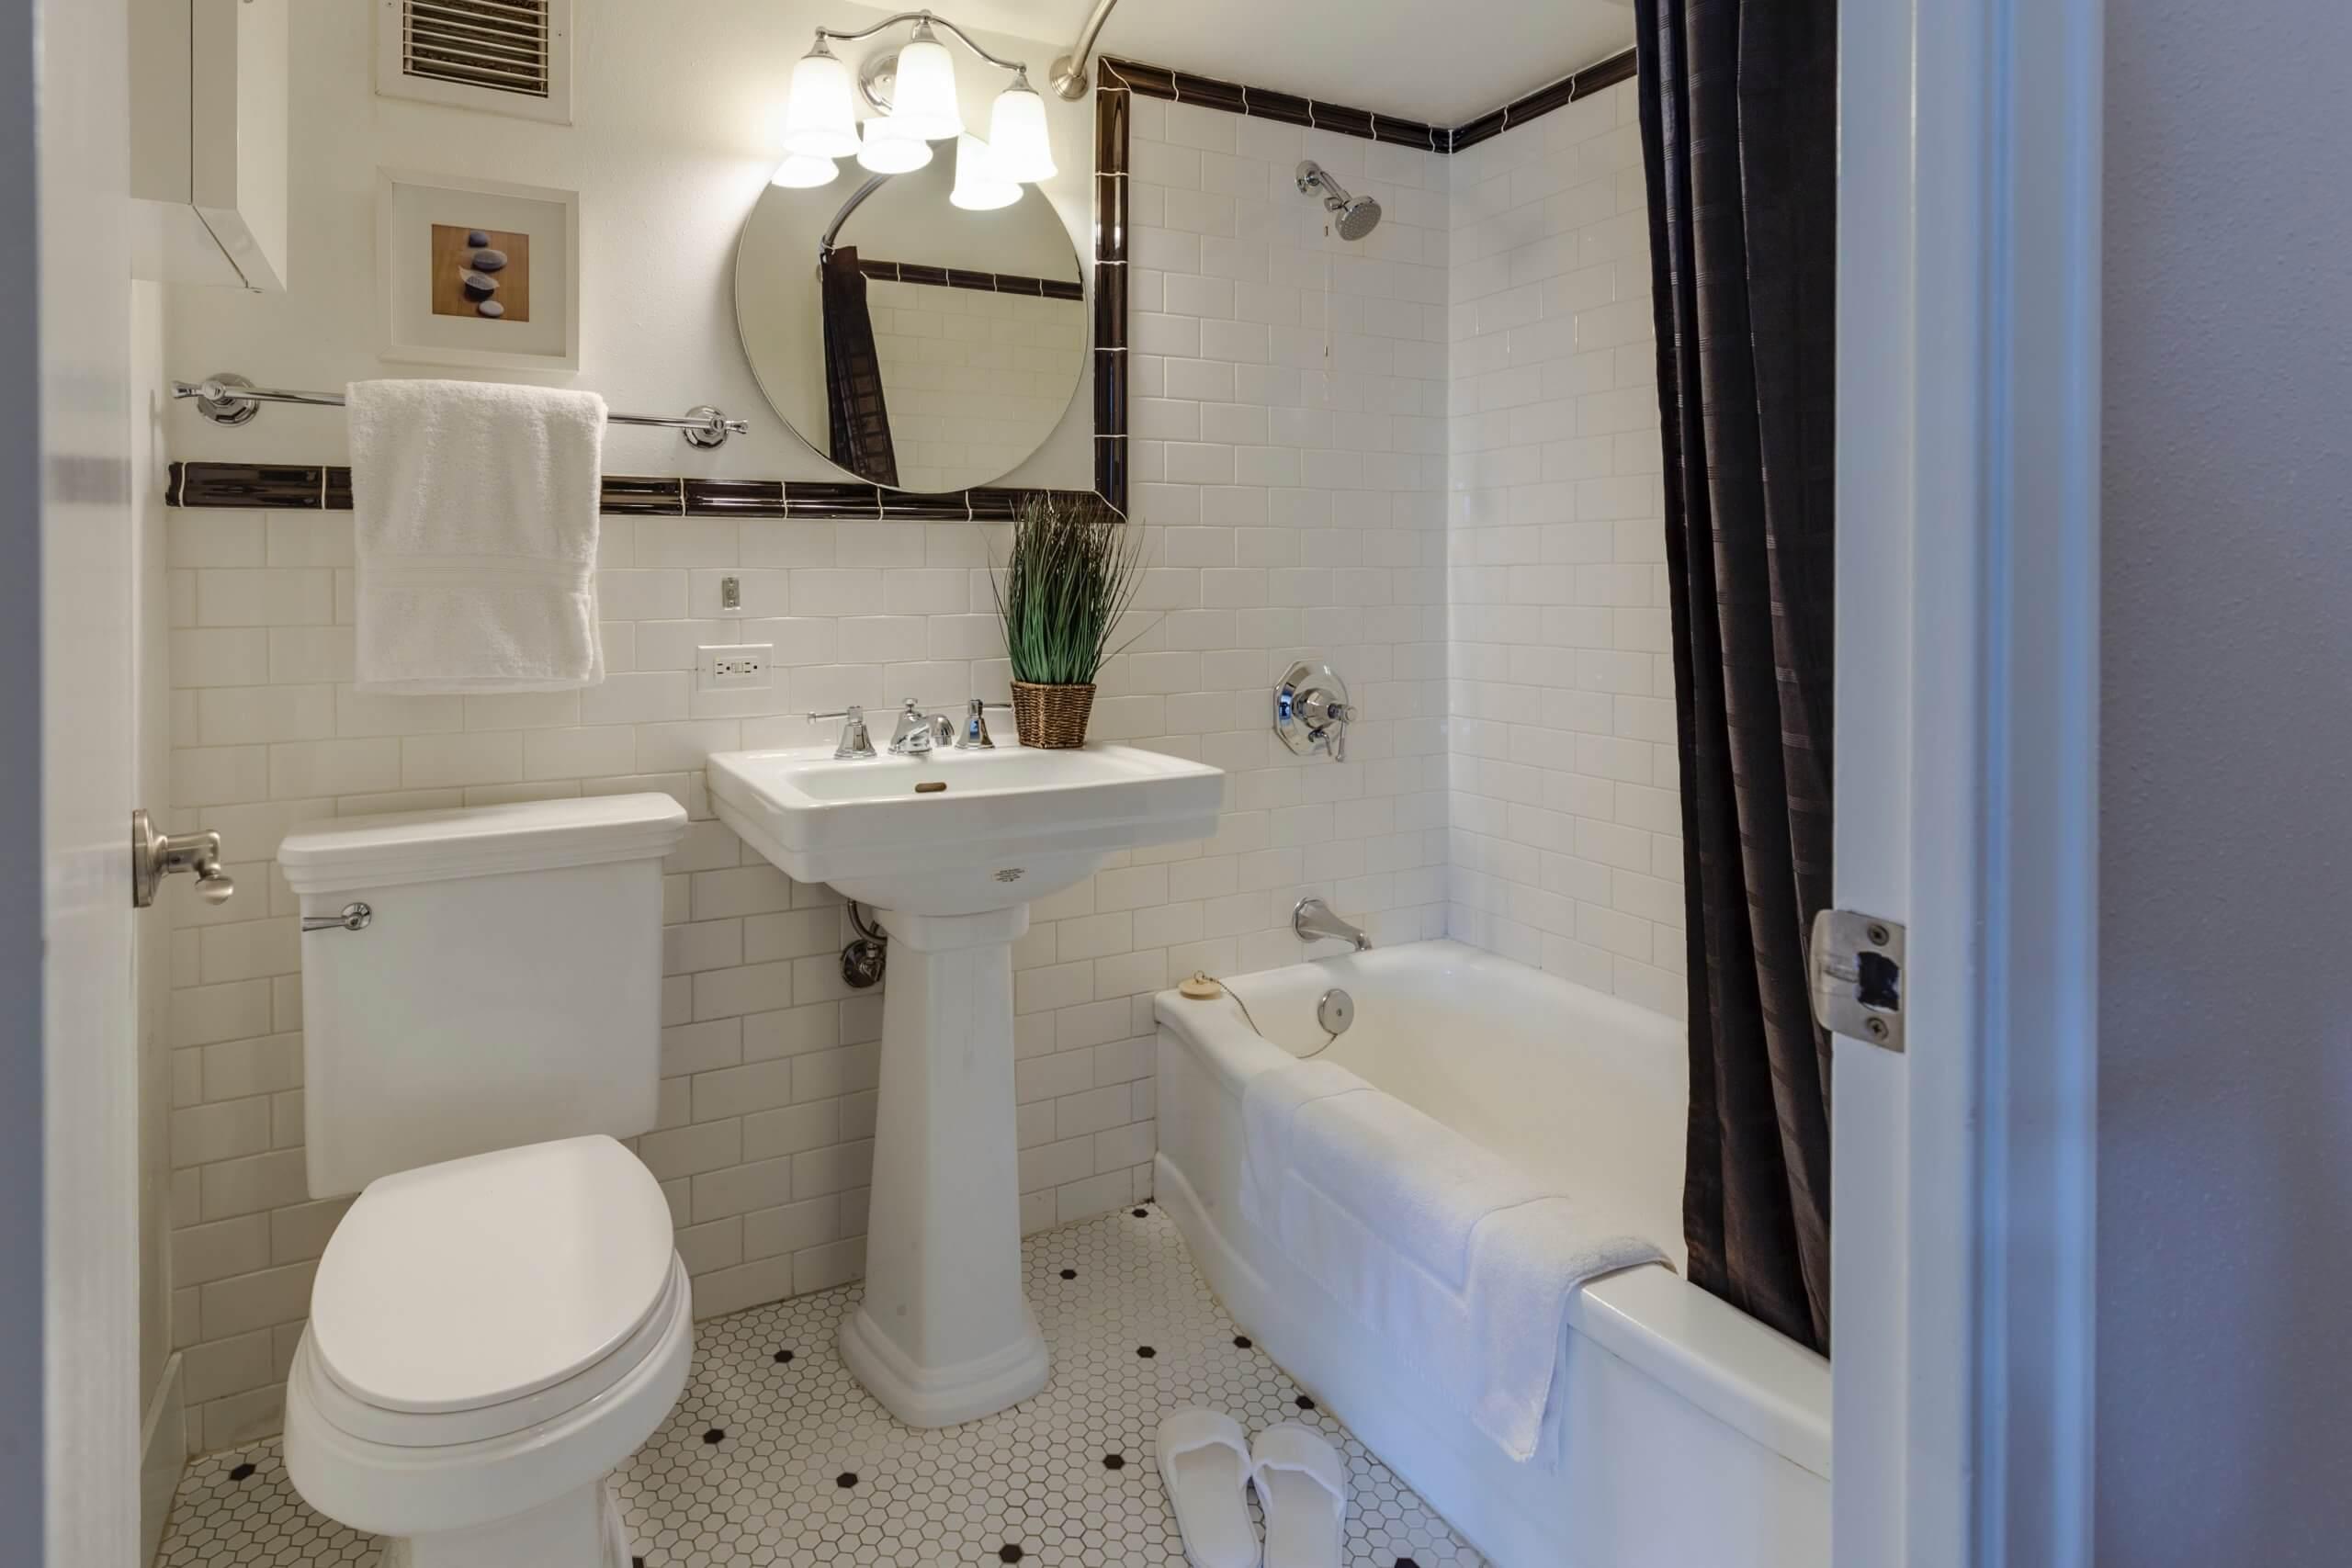 Bathroom Remodel Checklist | A Beginner's Guide